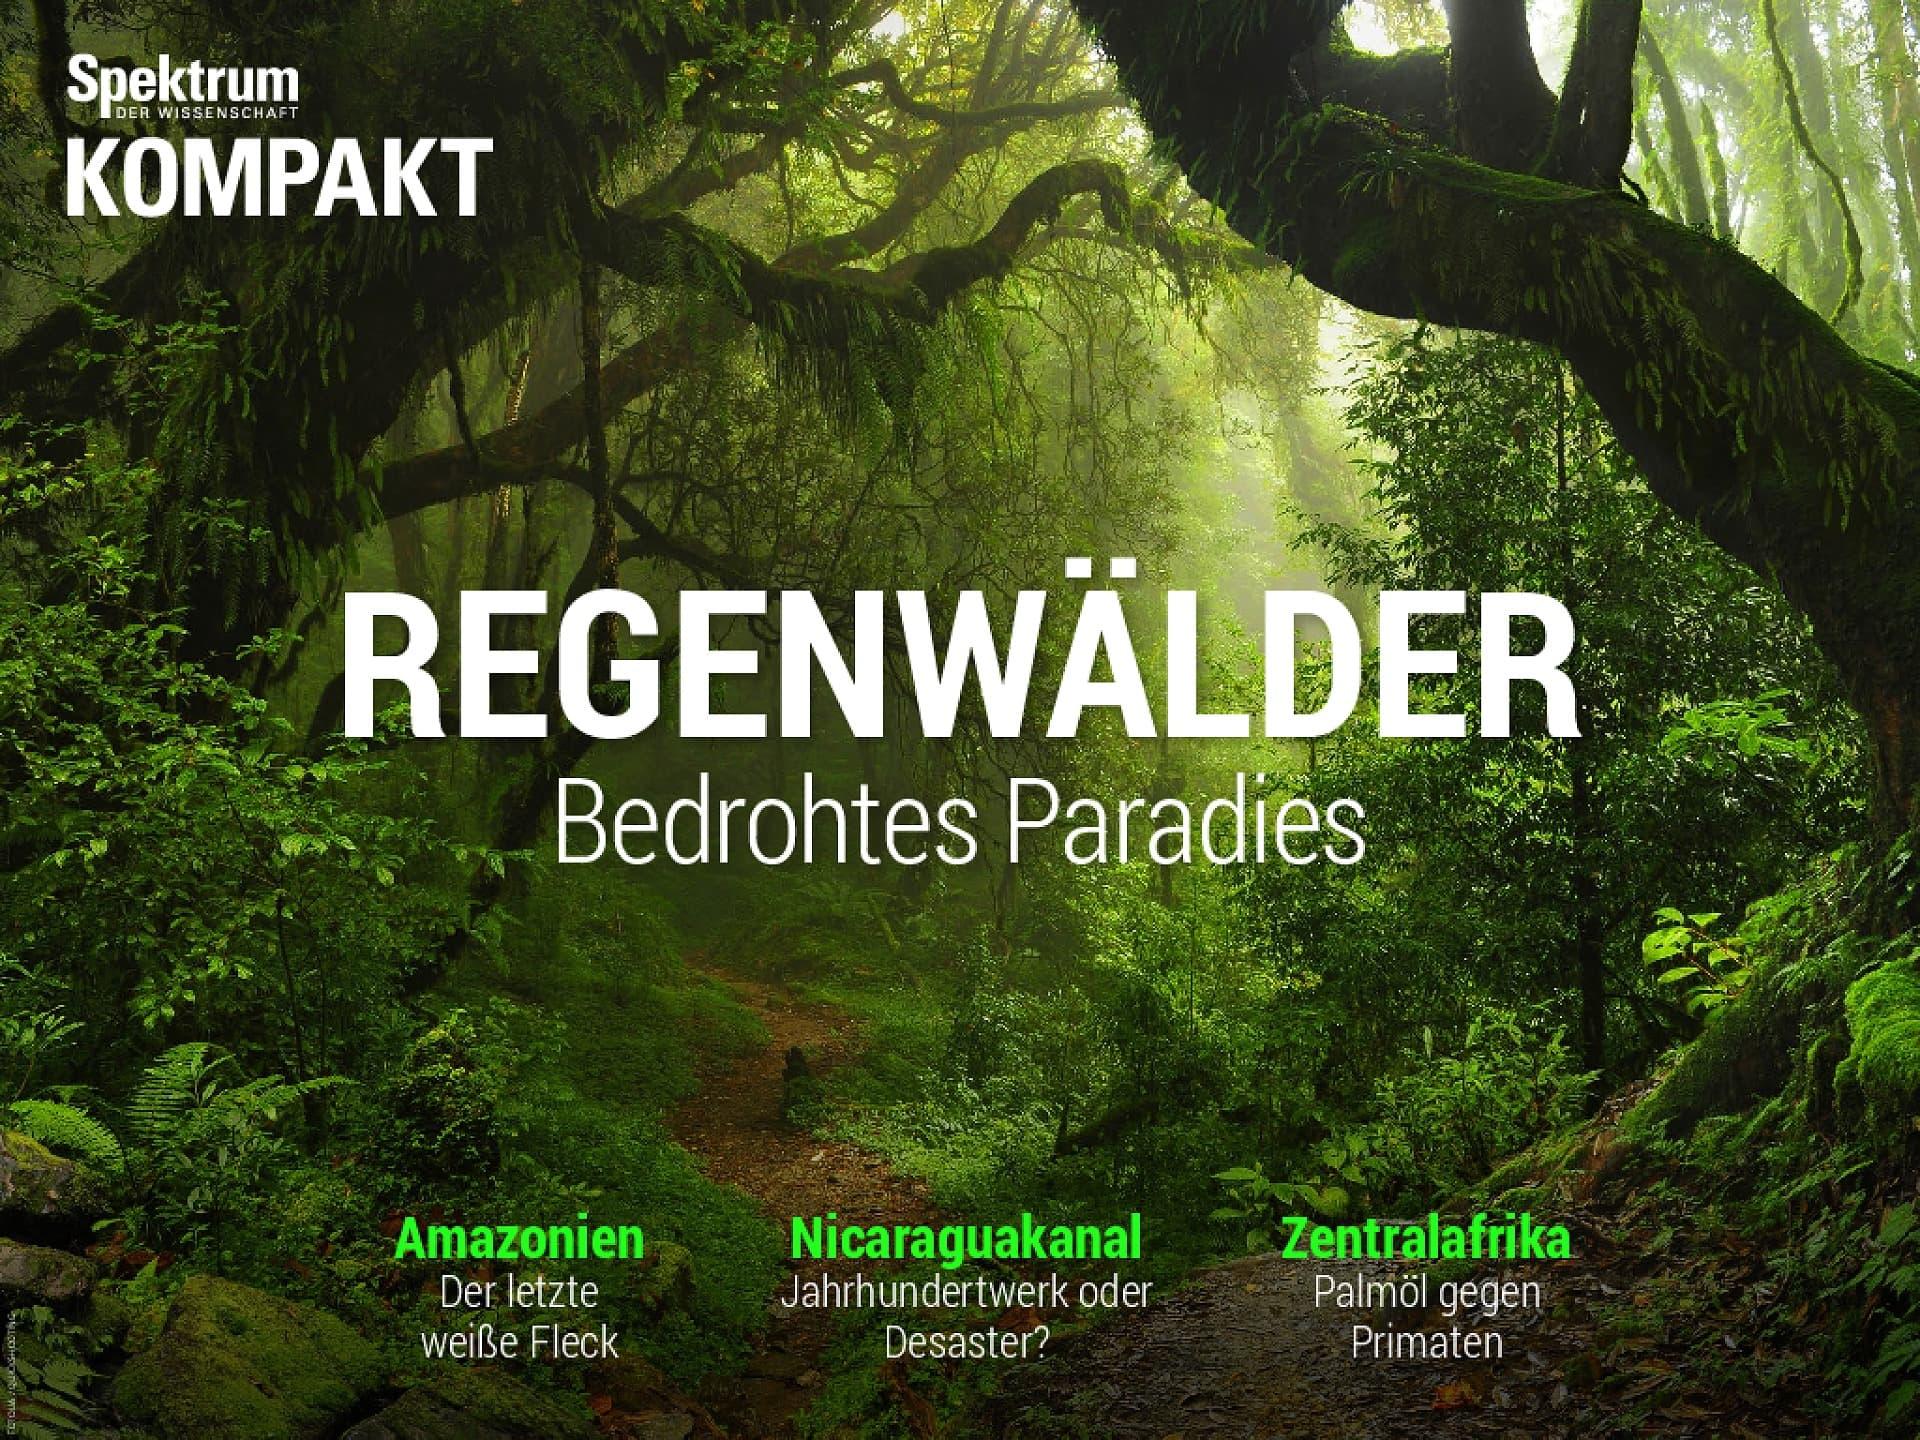 Regenwälder - Bedrohtes Paradies